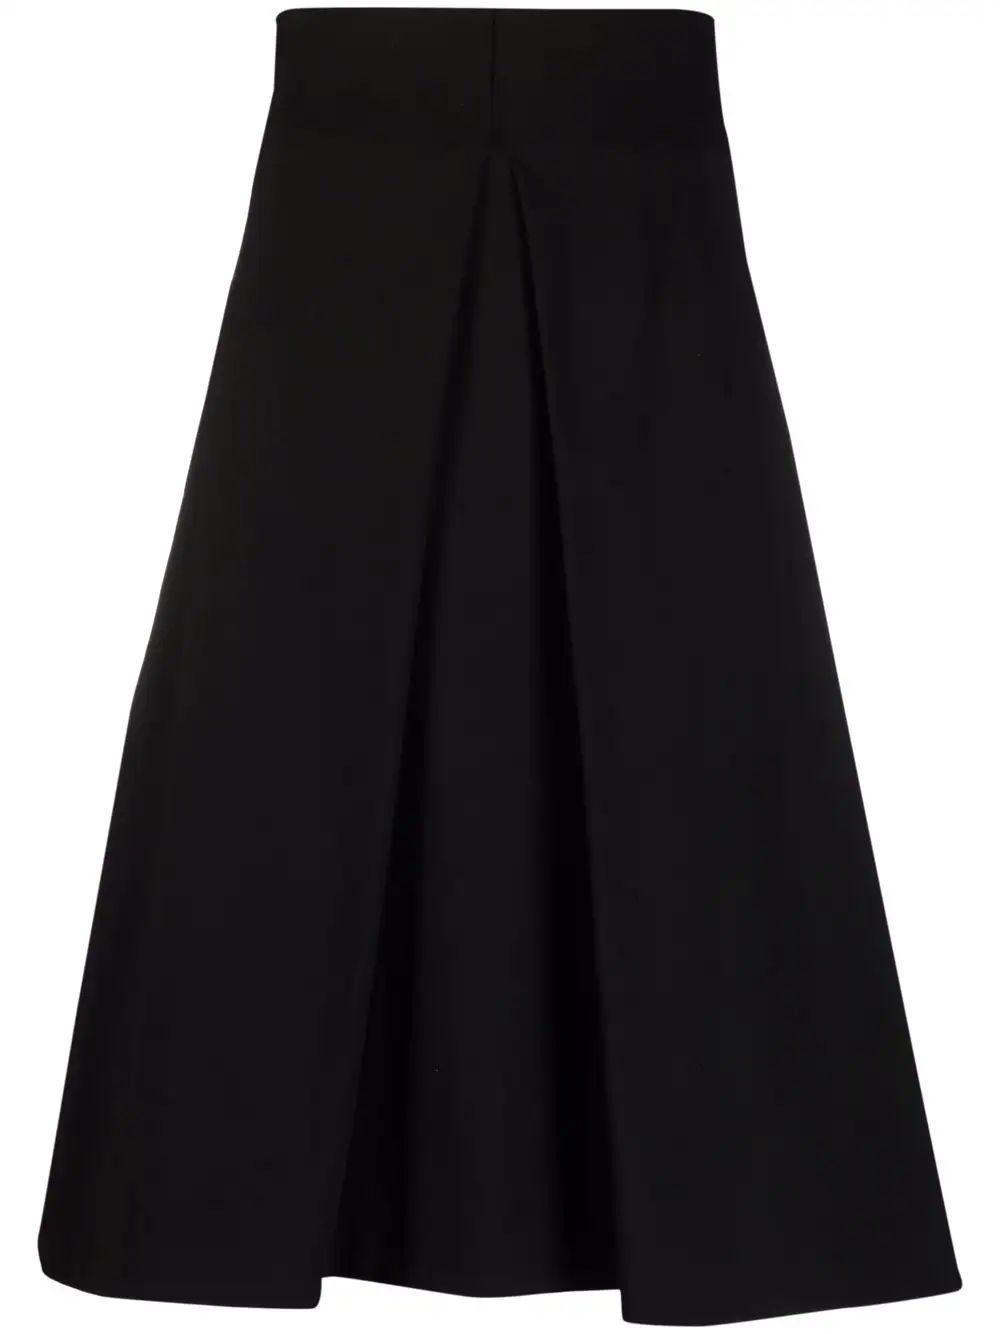 Emotional Essence Skirt Item # 213-448015